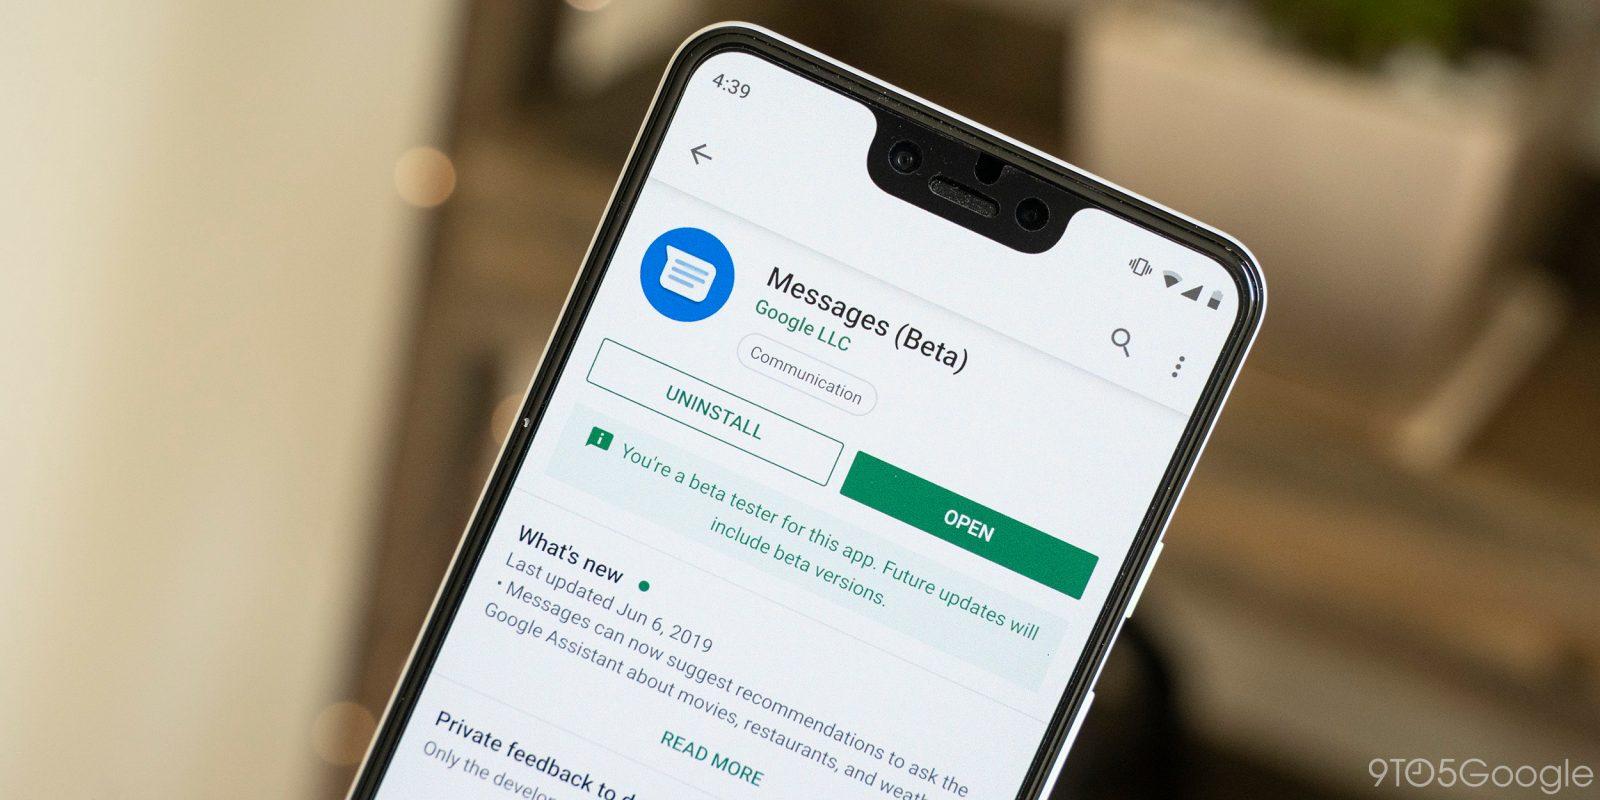 PSA: Google Messages Beta v4 7 crashes immediately on startup